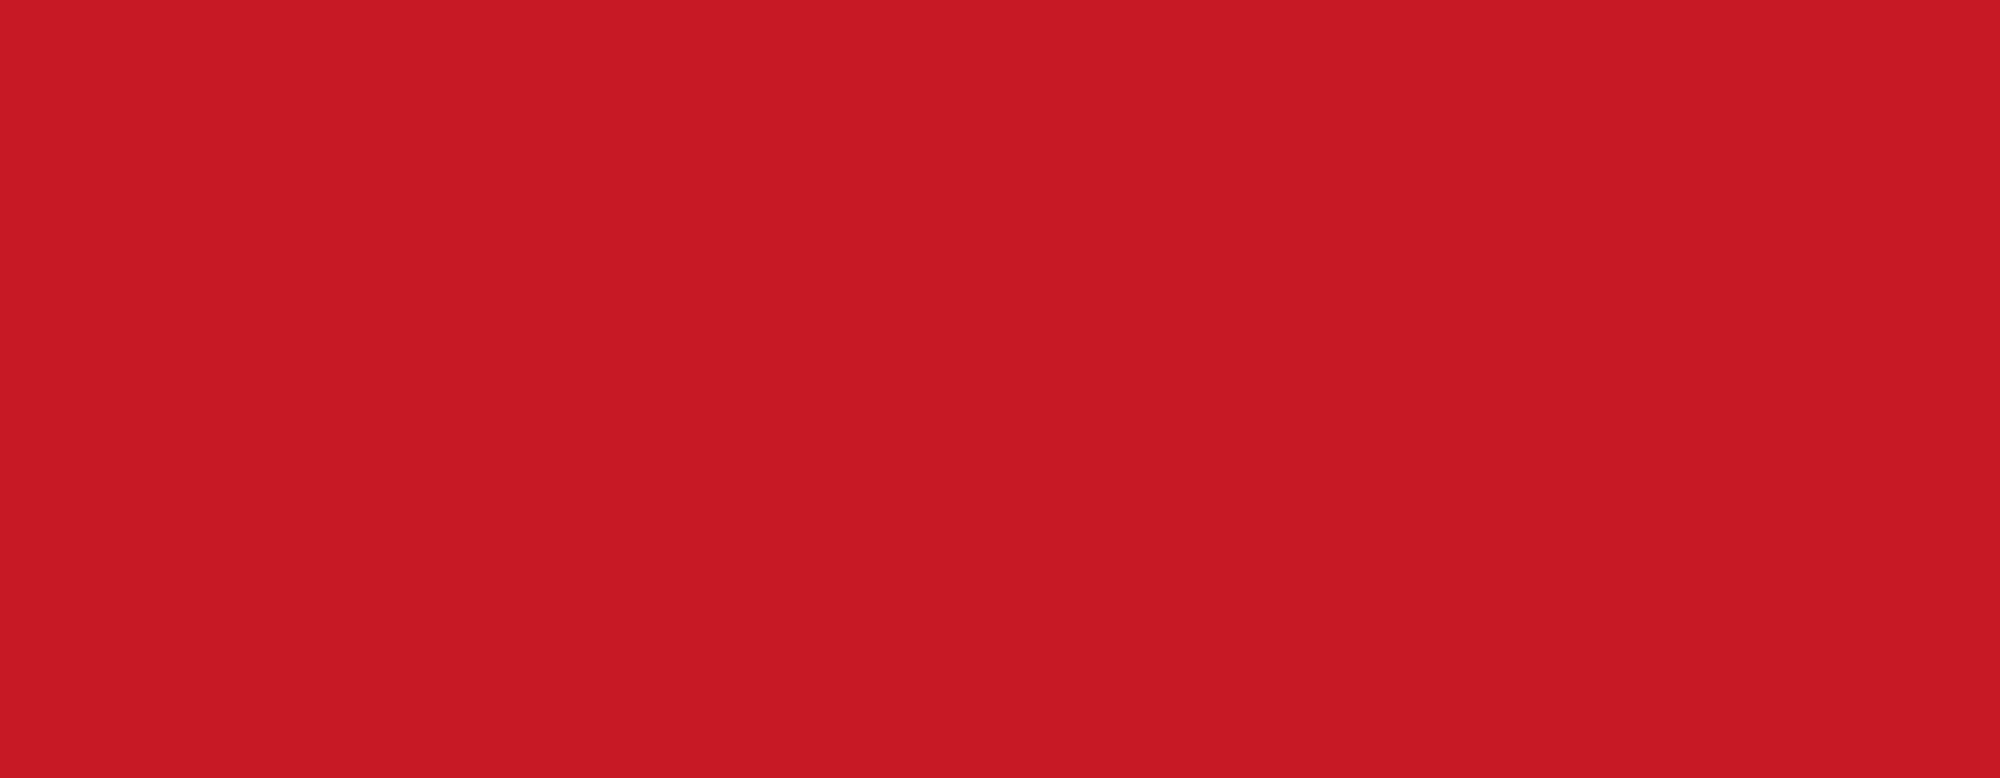 Spectrum Red SR